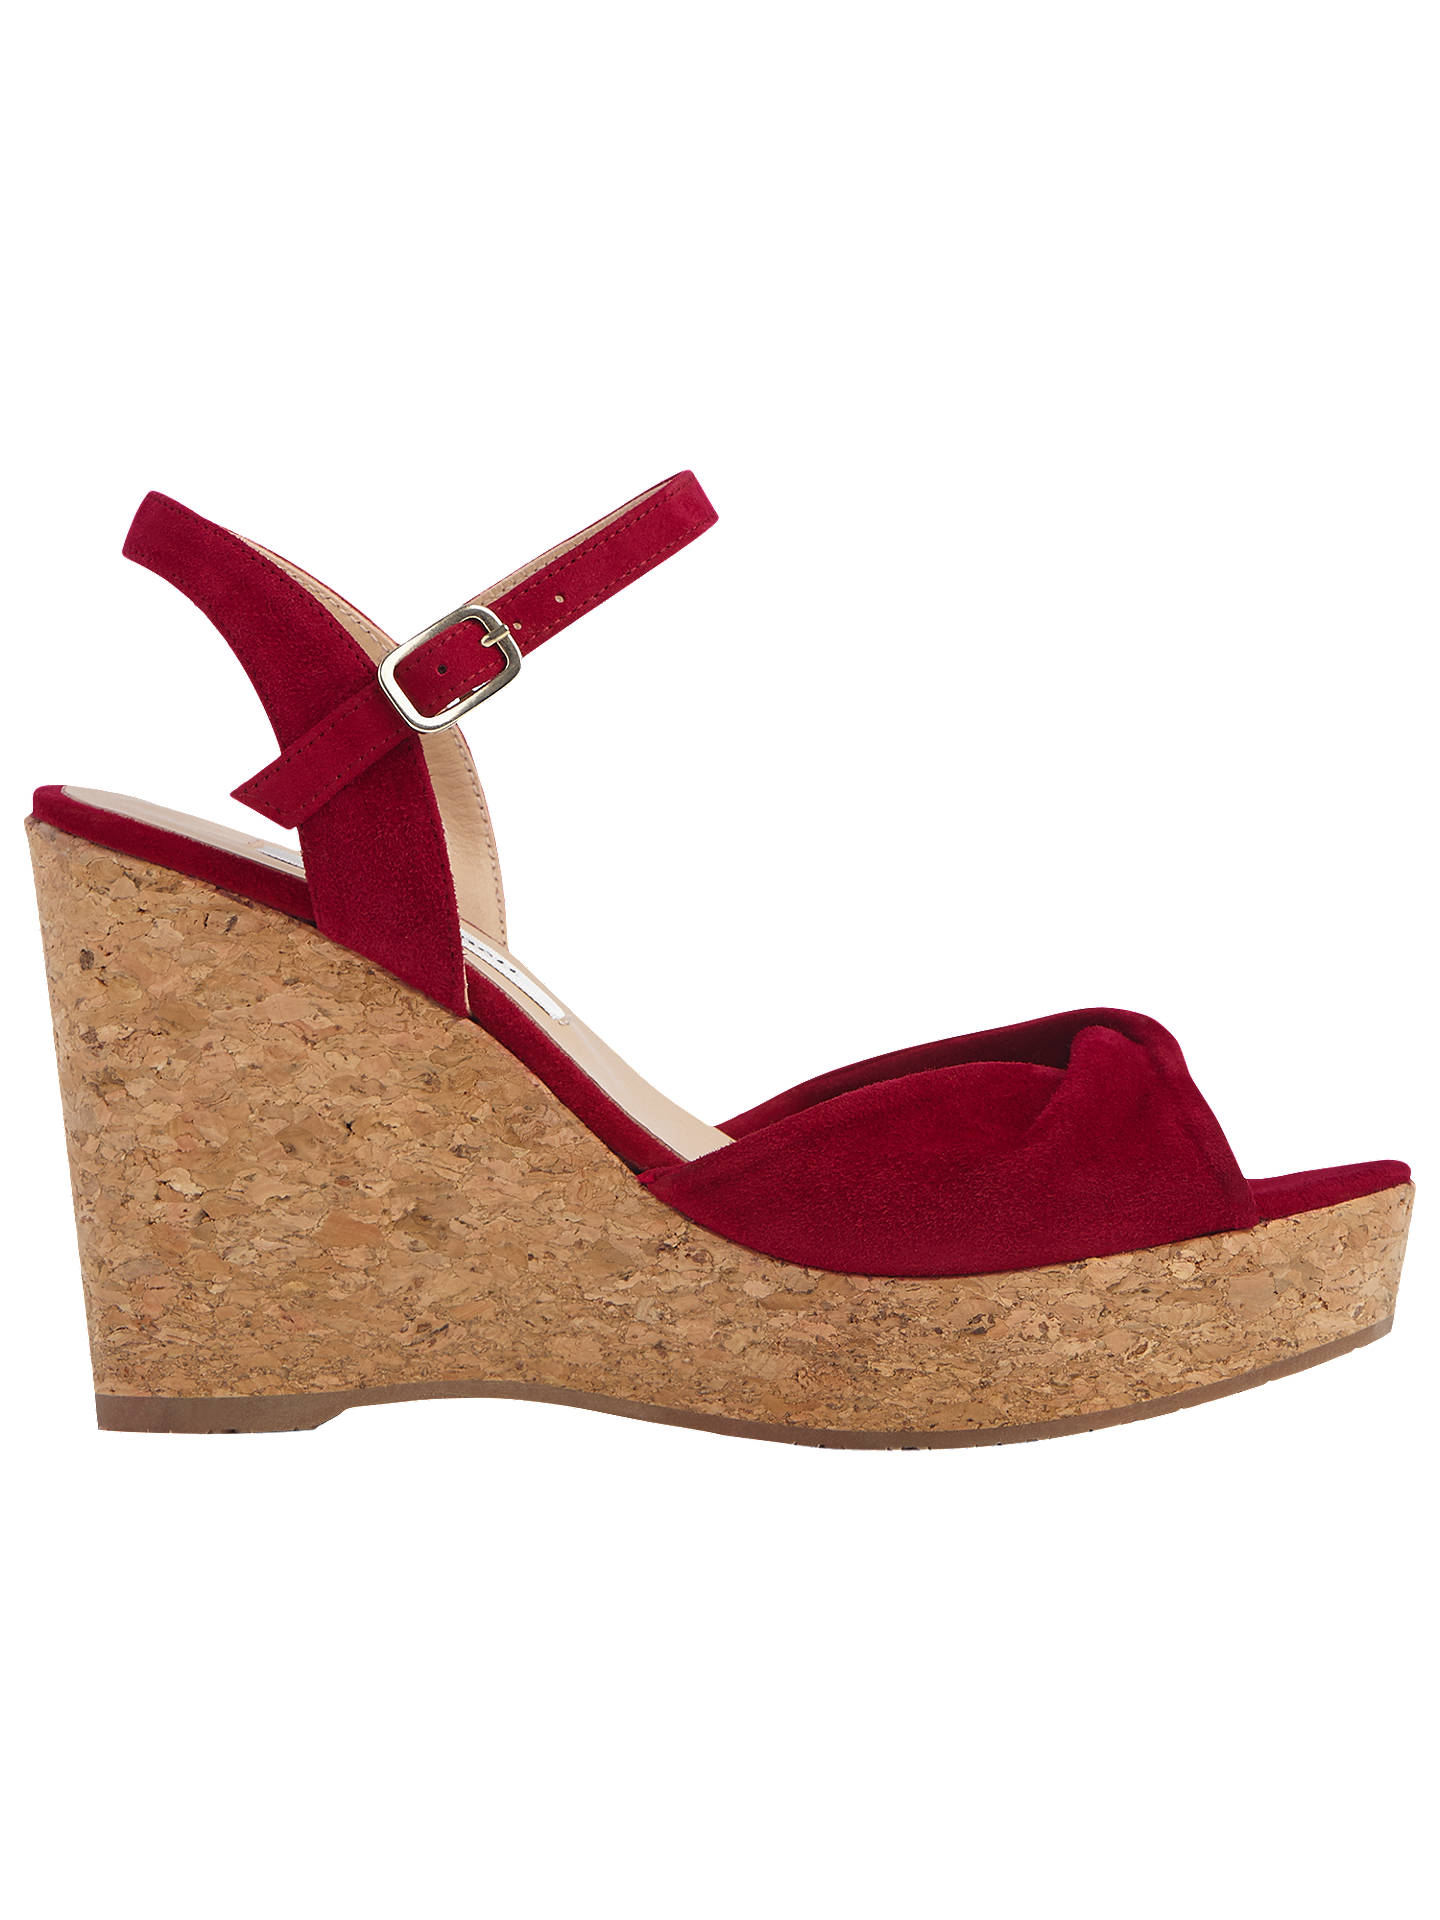 d40b9f6ccf2 L.K.Bennett Adeline Wedge Heel Sandals at John Lewis & Partners